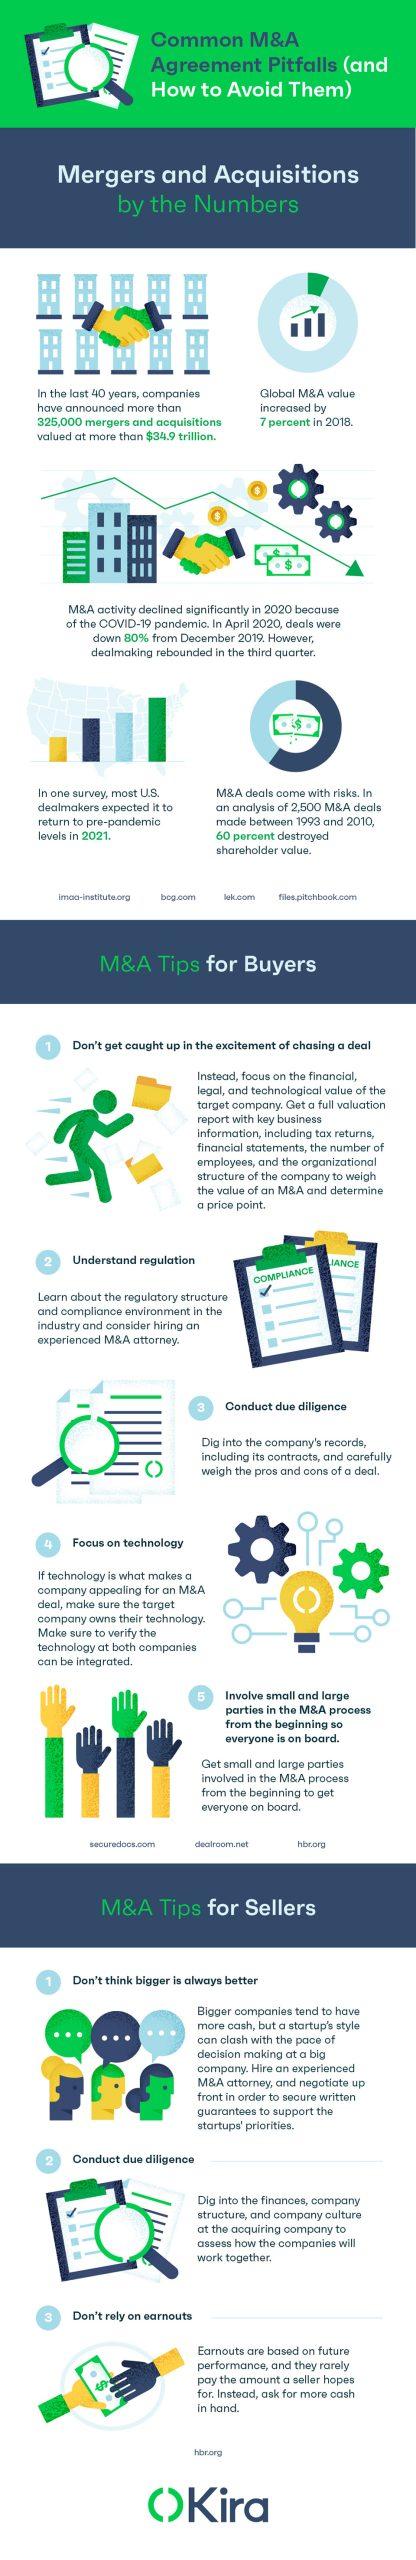 merger-aquisitions-pitfalls-to-avoid